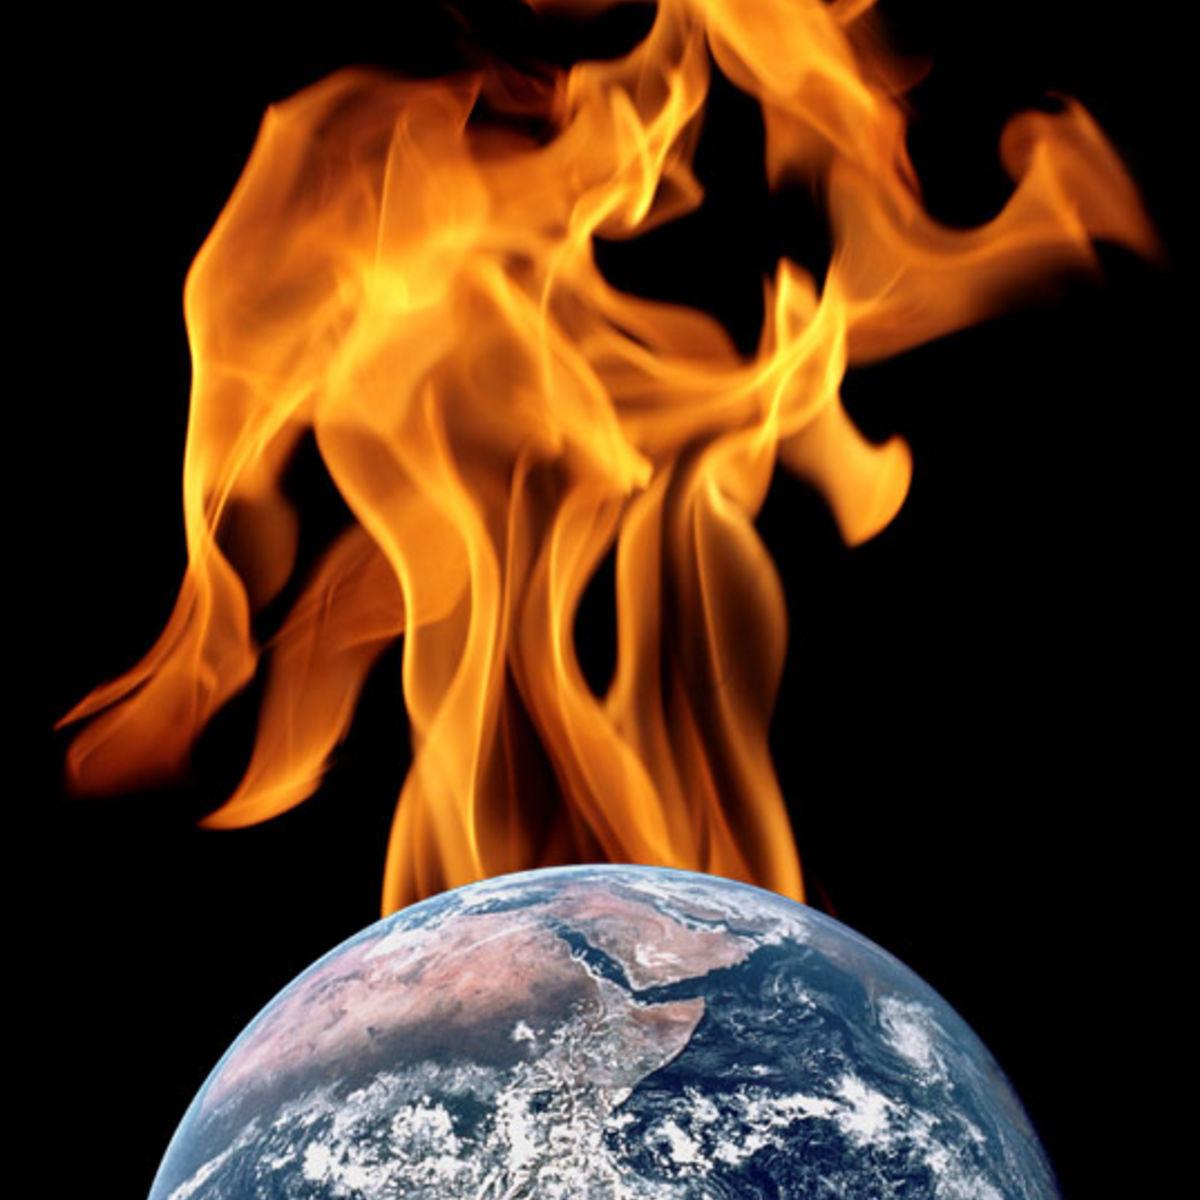 earthonfire_2.jpg